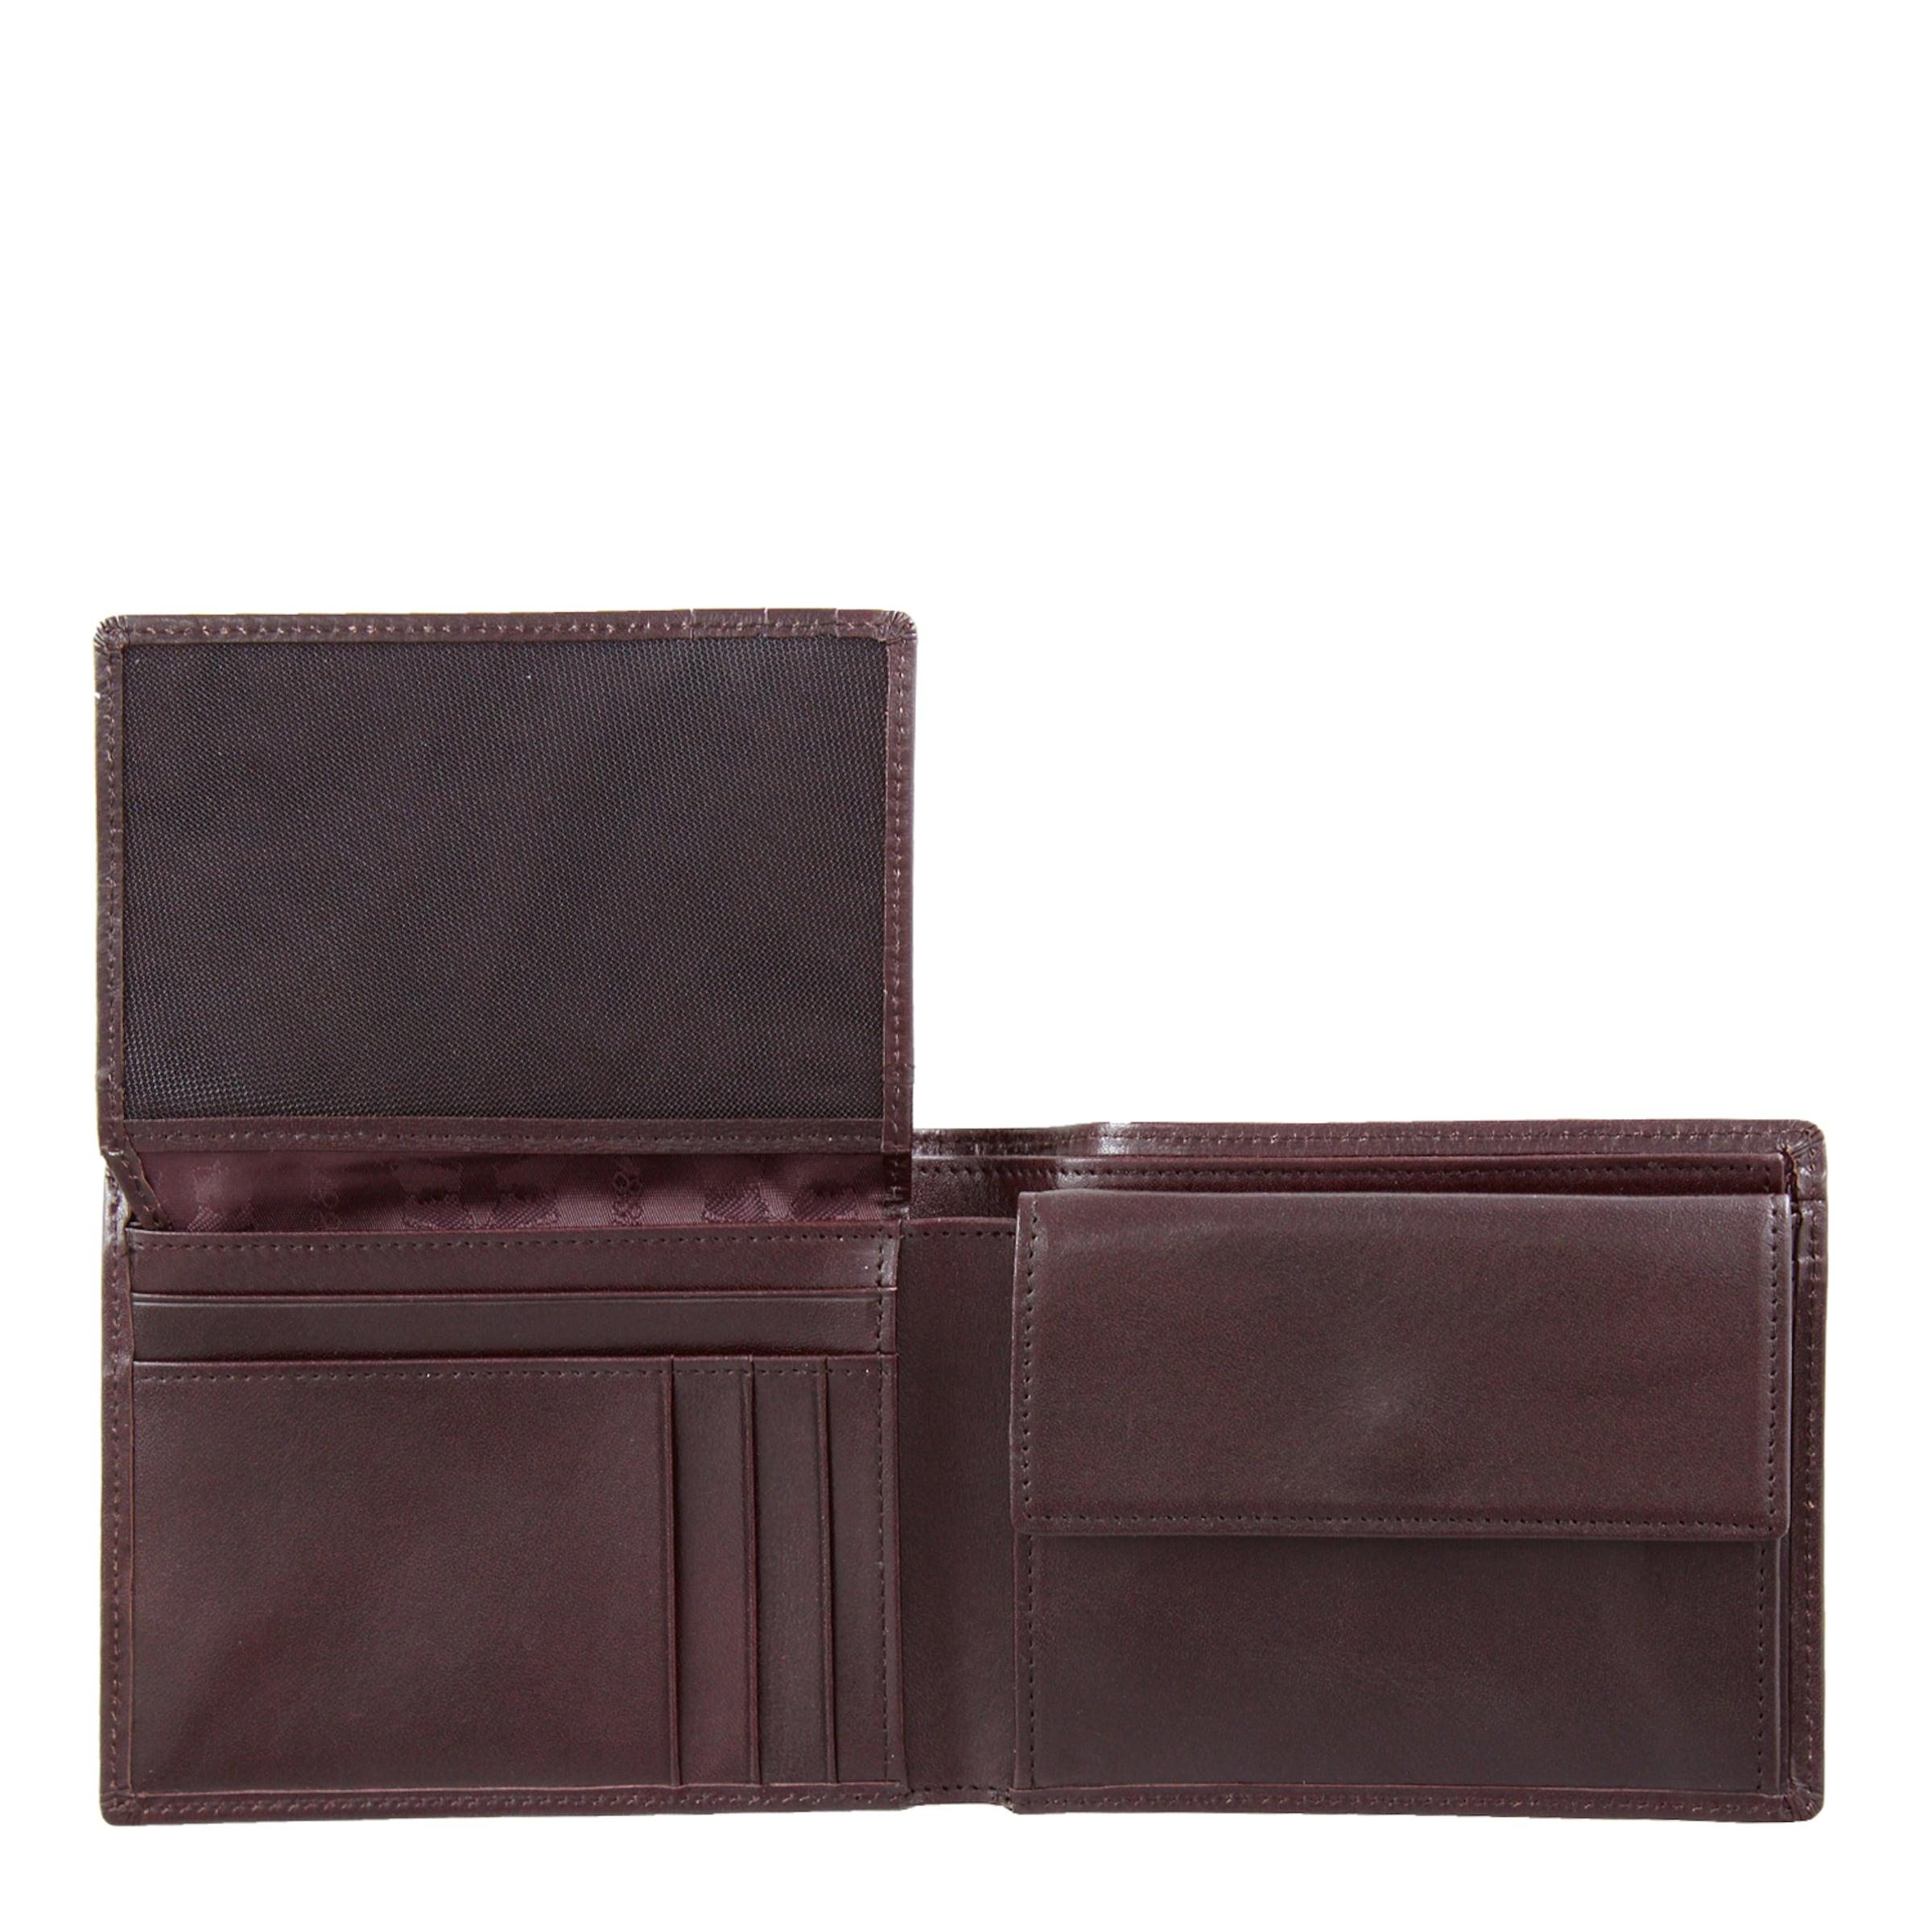 'gaucho' Geldbörse Rot Braun Büffel In 8PNXwOn0k